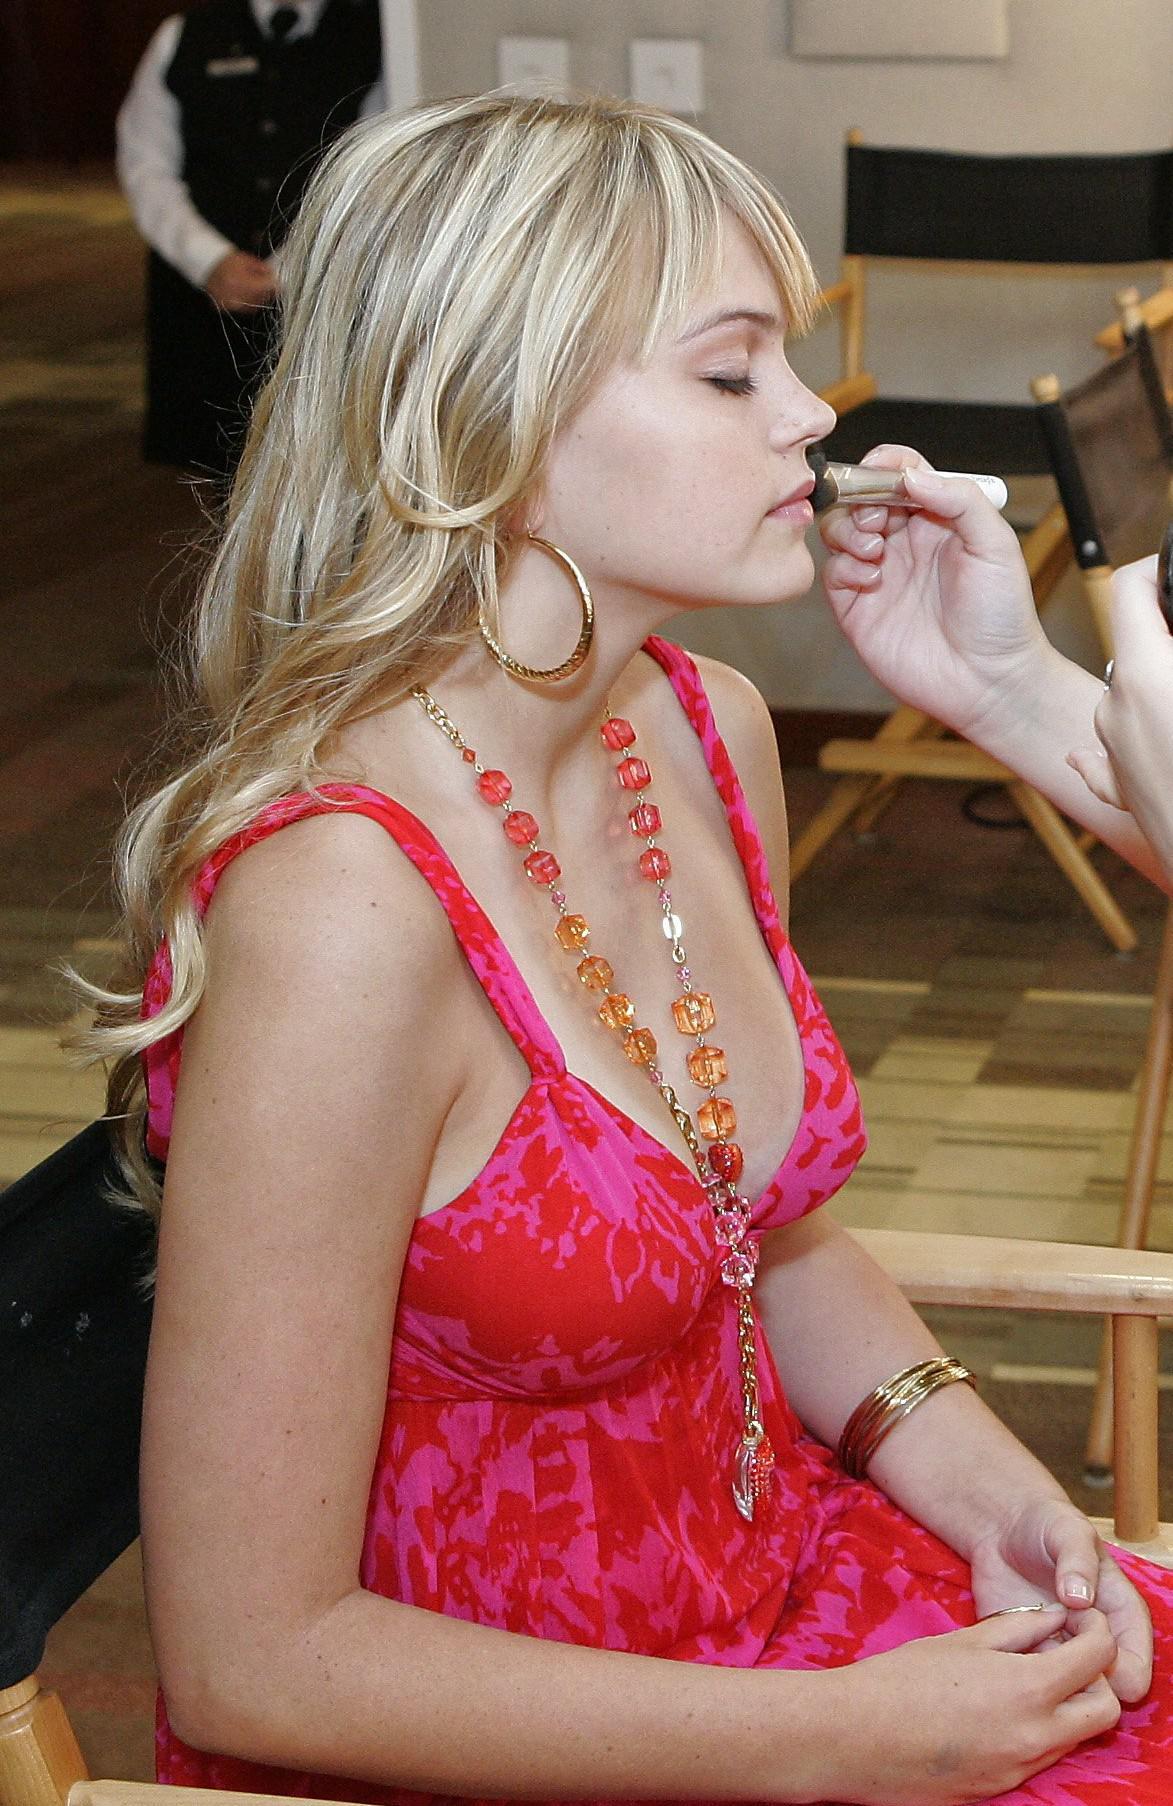 Aimee Teegarden nue, 88 Photos, biographie, news de stars